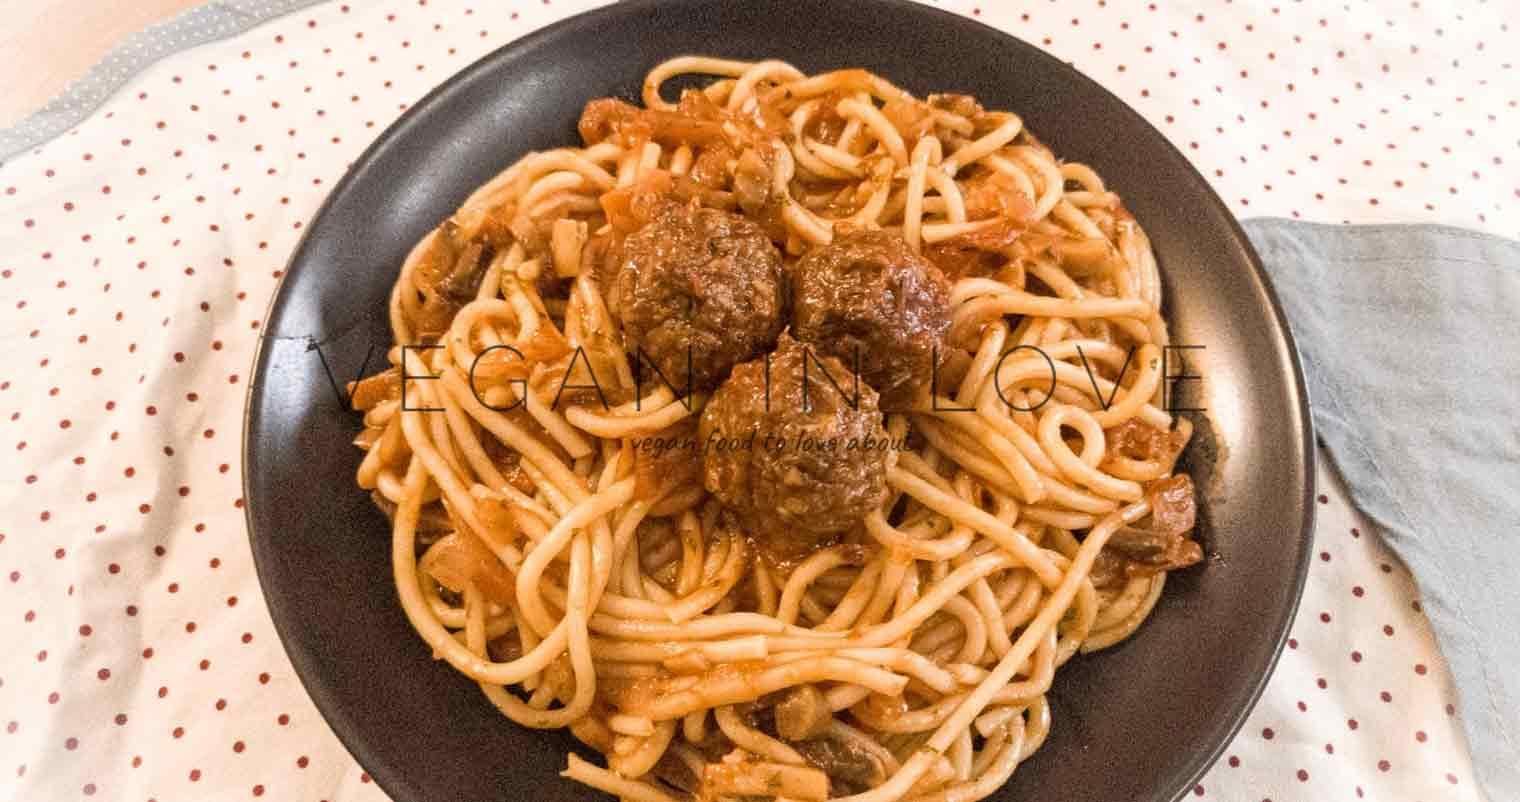 Spaghetti & vegan meatballs